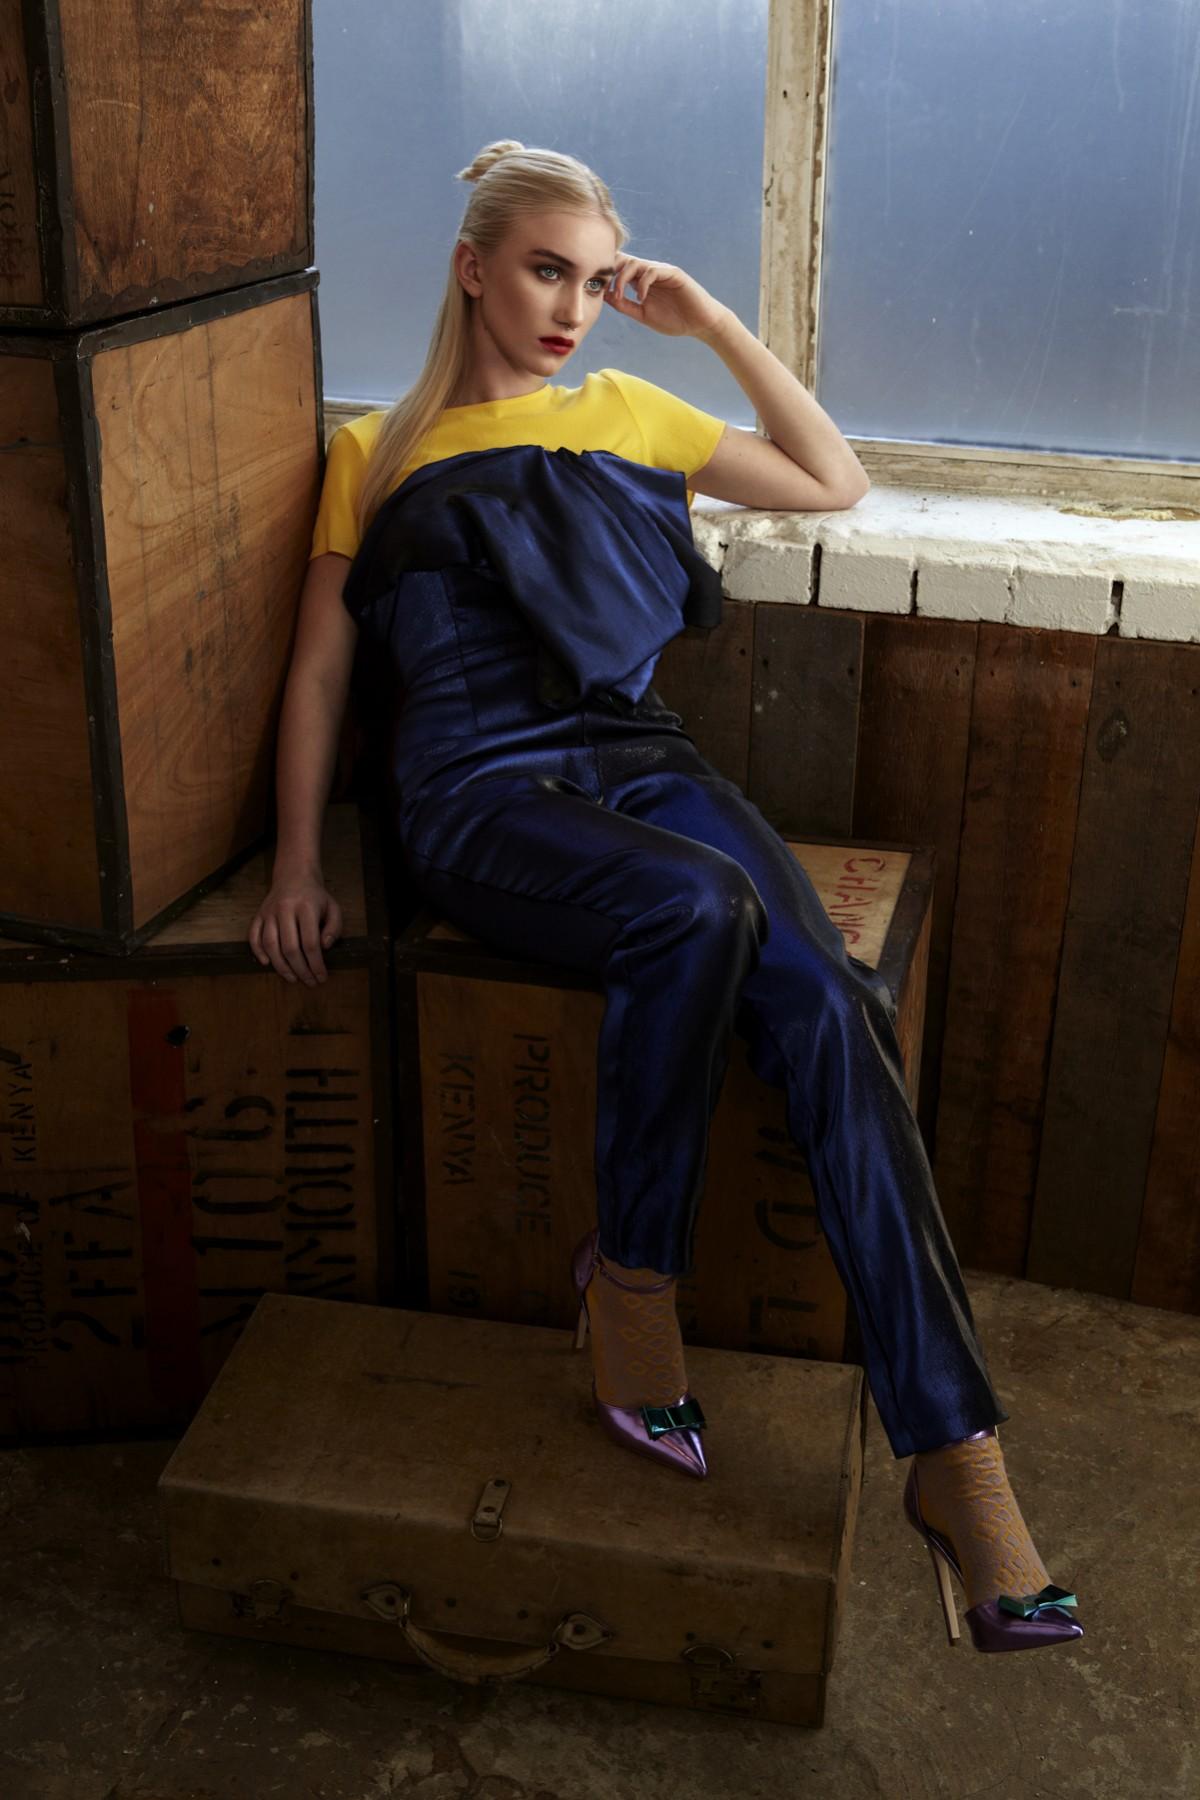 Ioannis Koussertari_photographer_print-factory-Geist-magazine-8-1200x1800.jpg